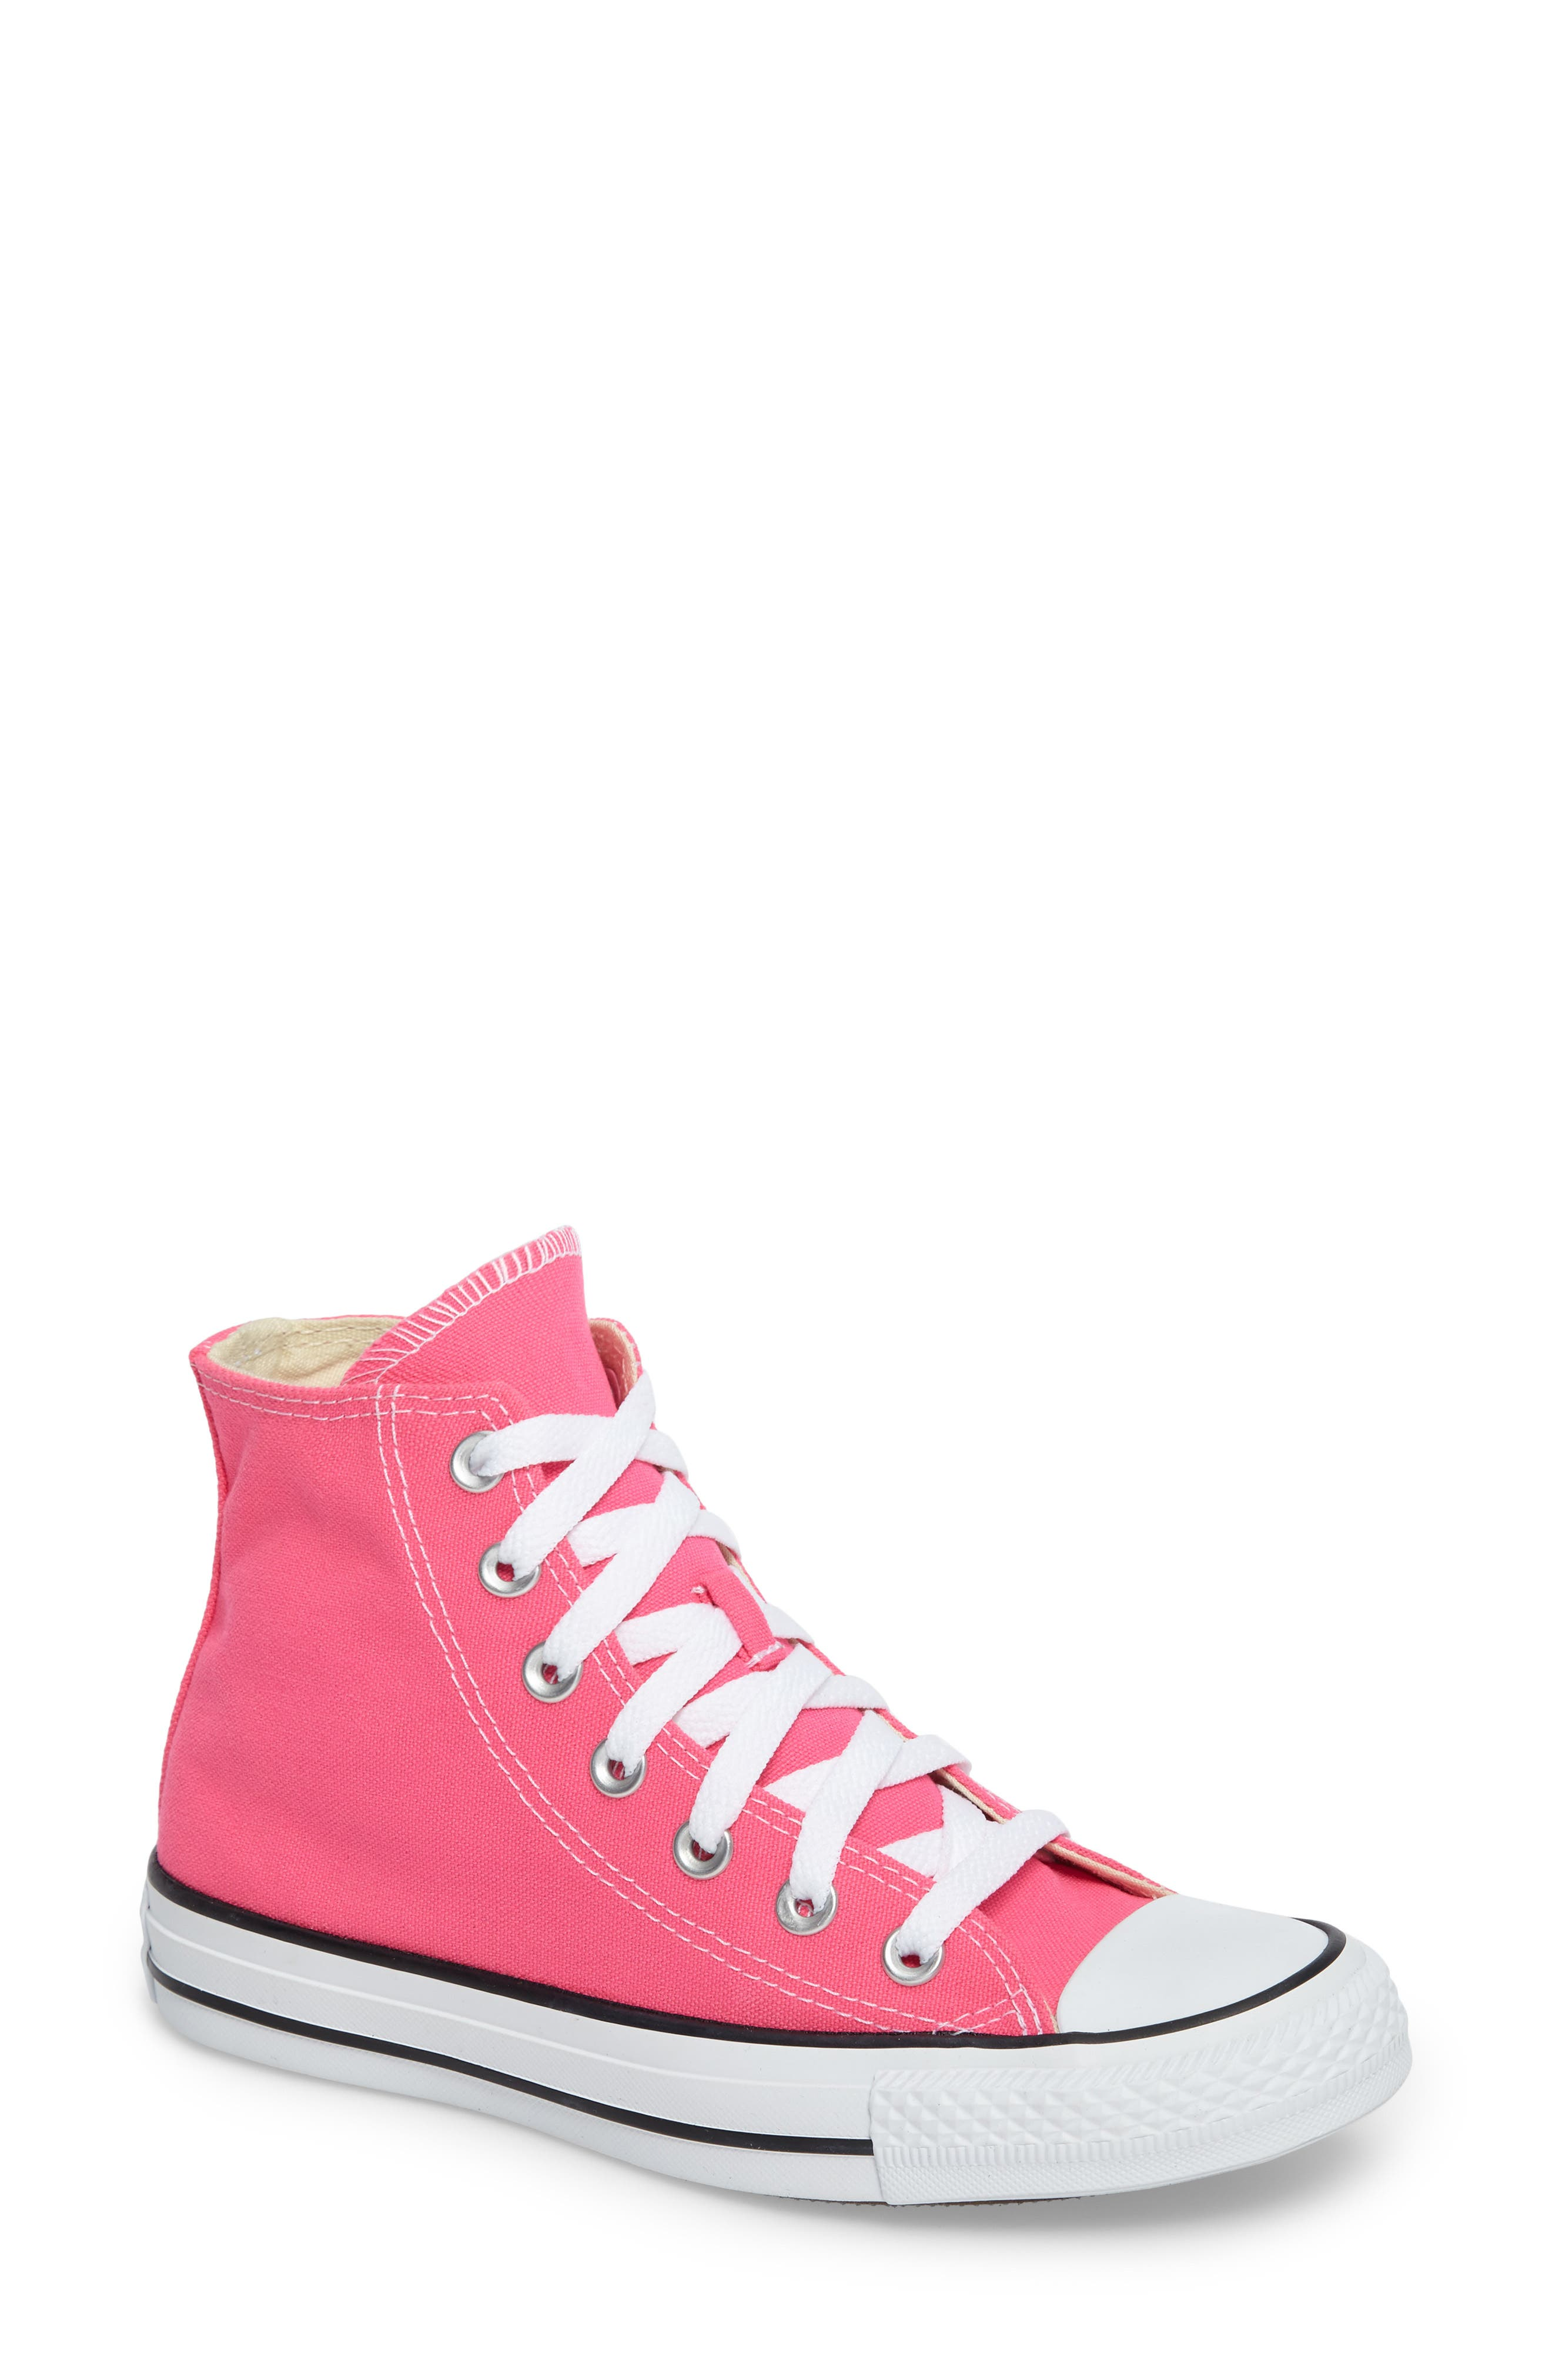 Alternate Image 1 Selected - Converse Chuck Taylor® All Star® Seasonal Hi Sneaker (Women)